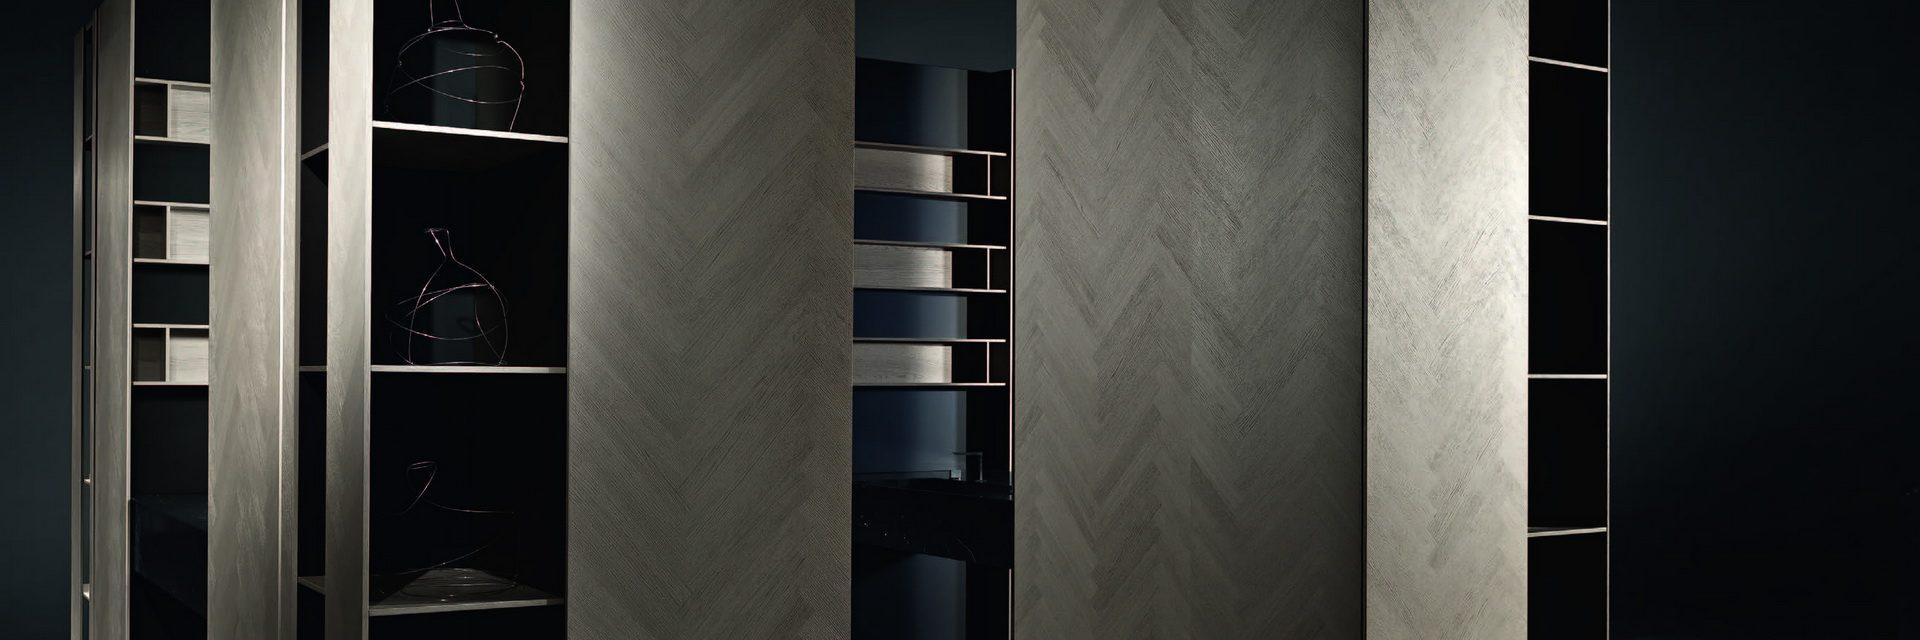 Binova Milano - Durini Design - Cucine Moderne di Design Made in Italy